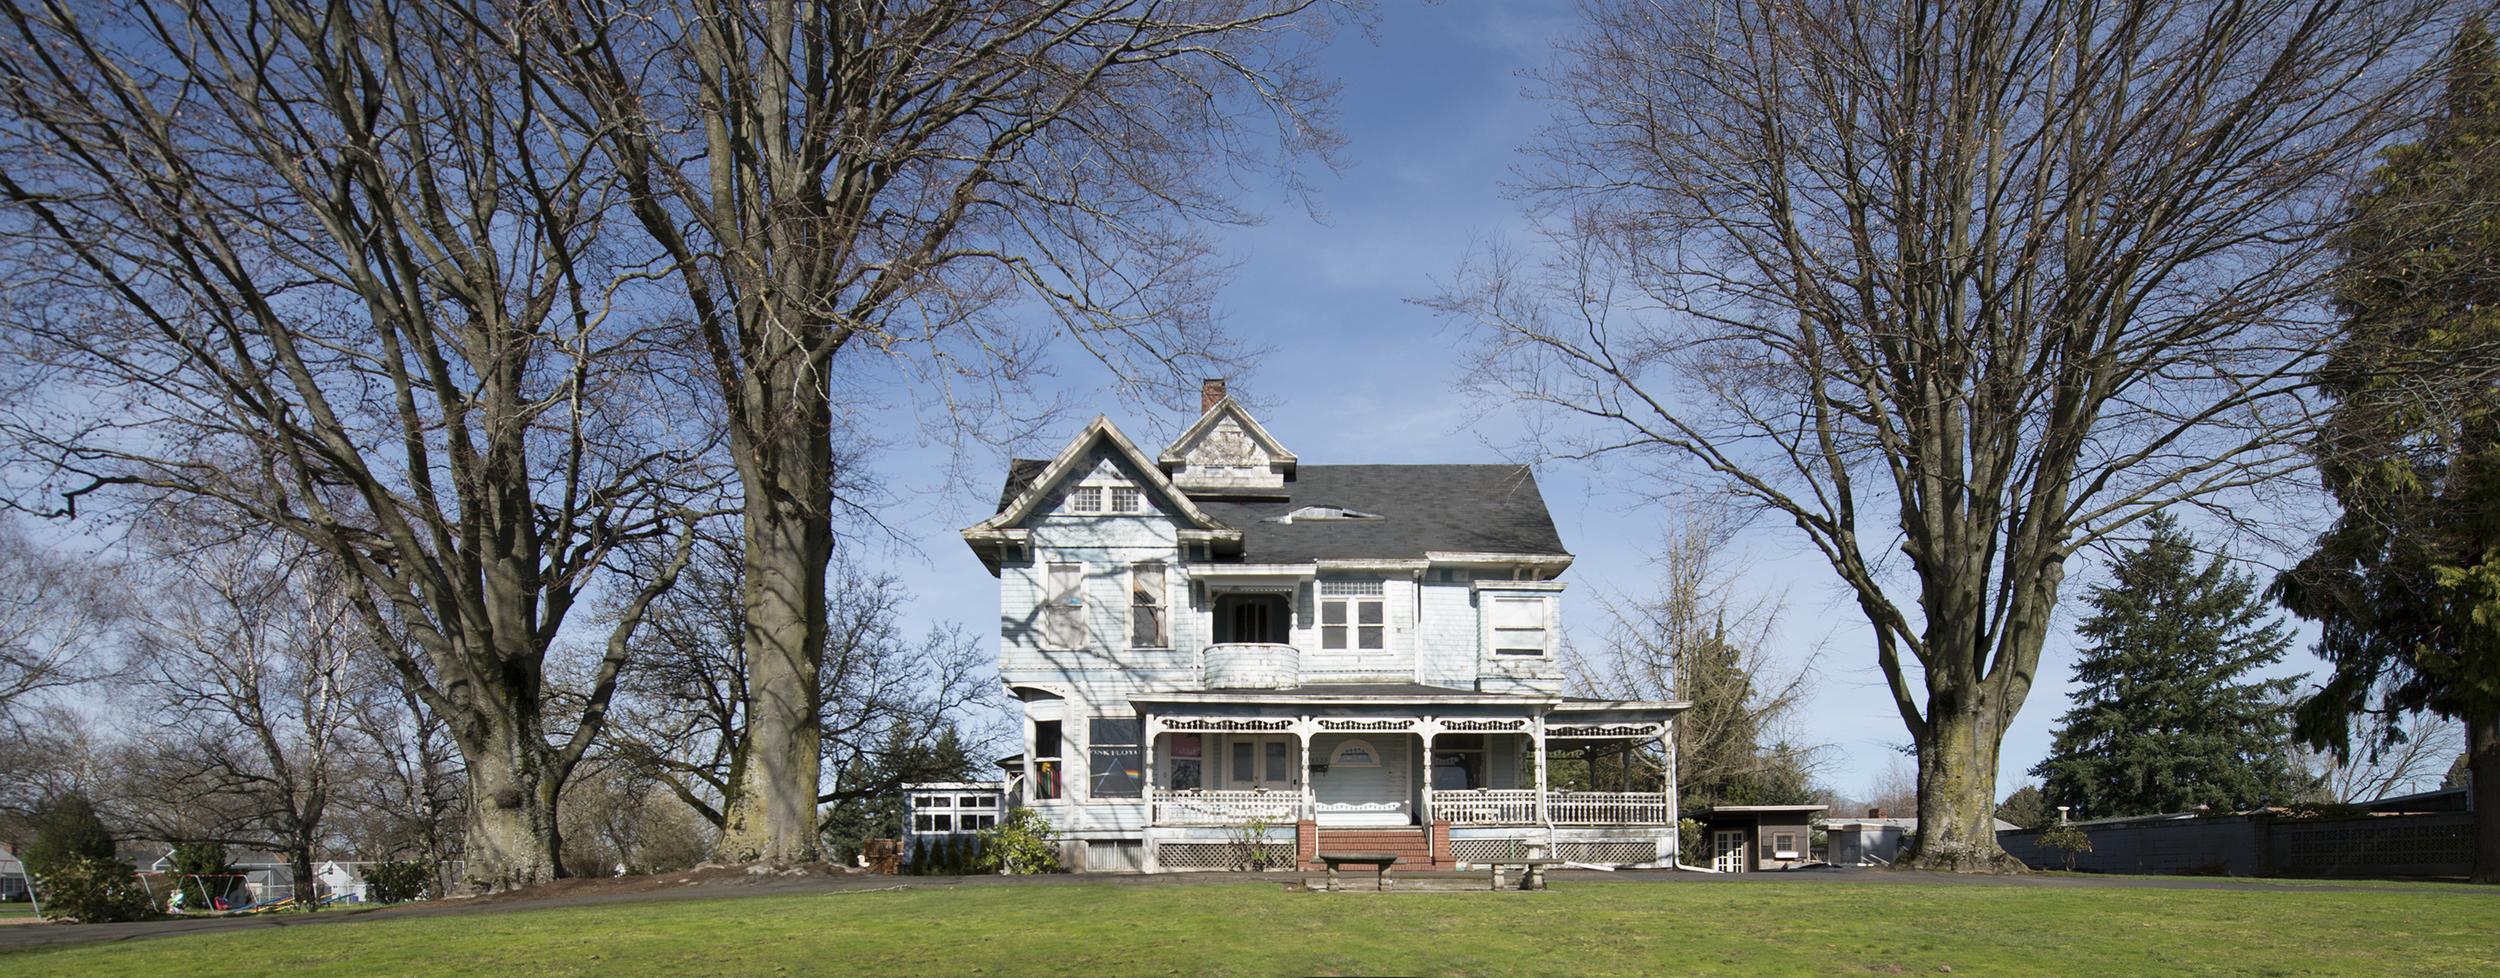 Old Blue House.jpg